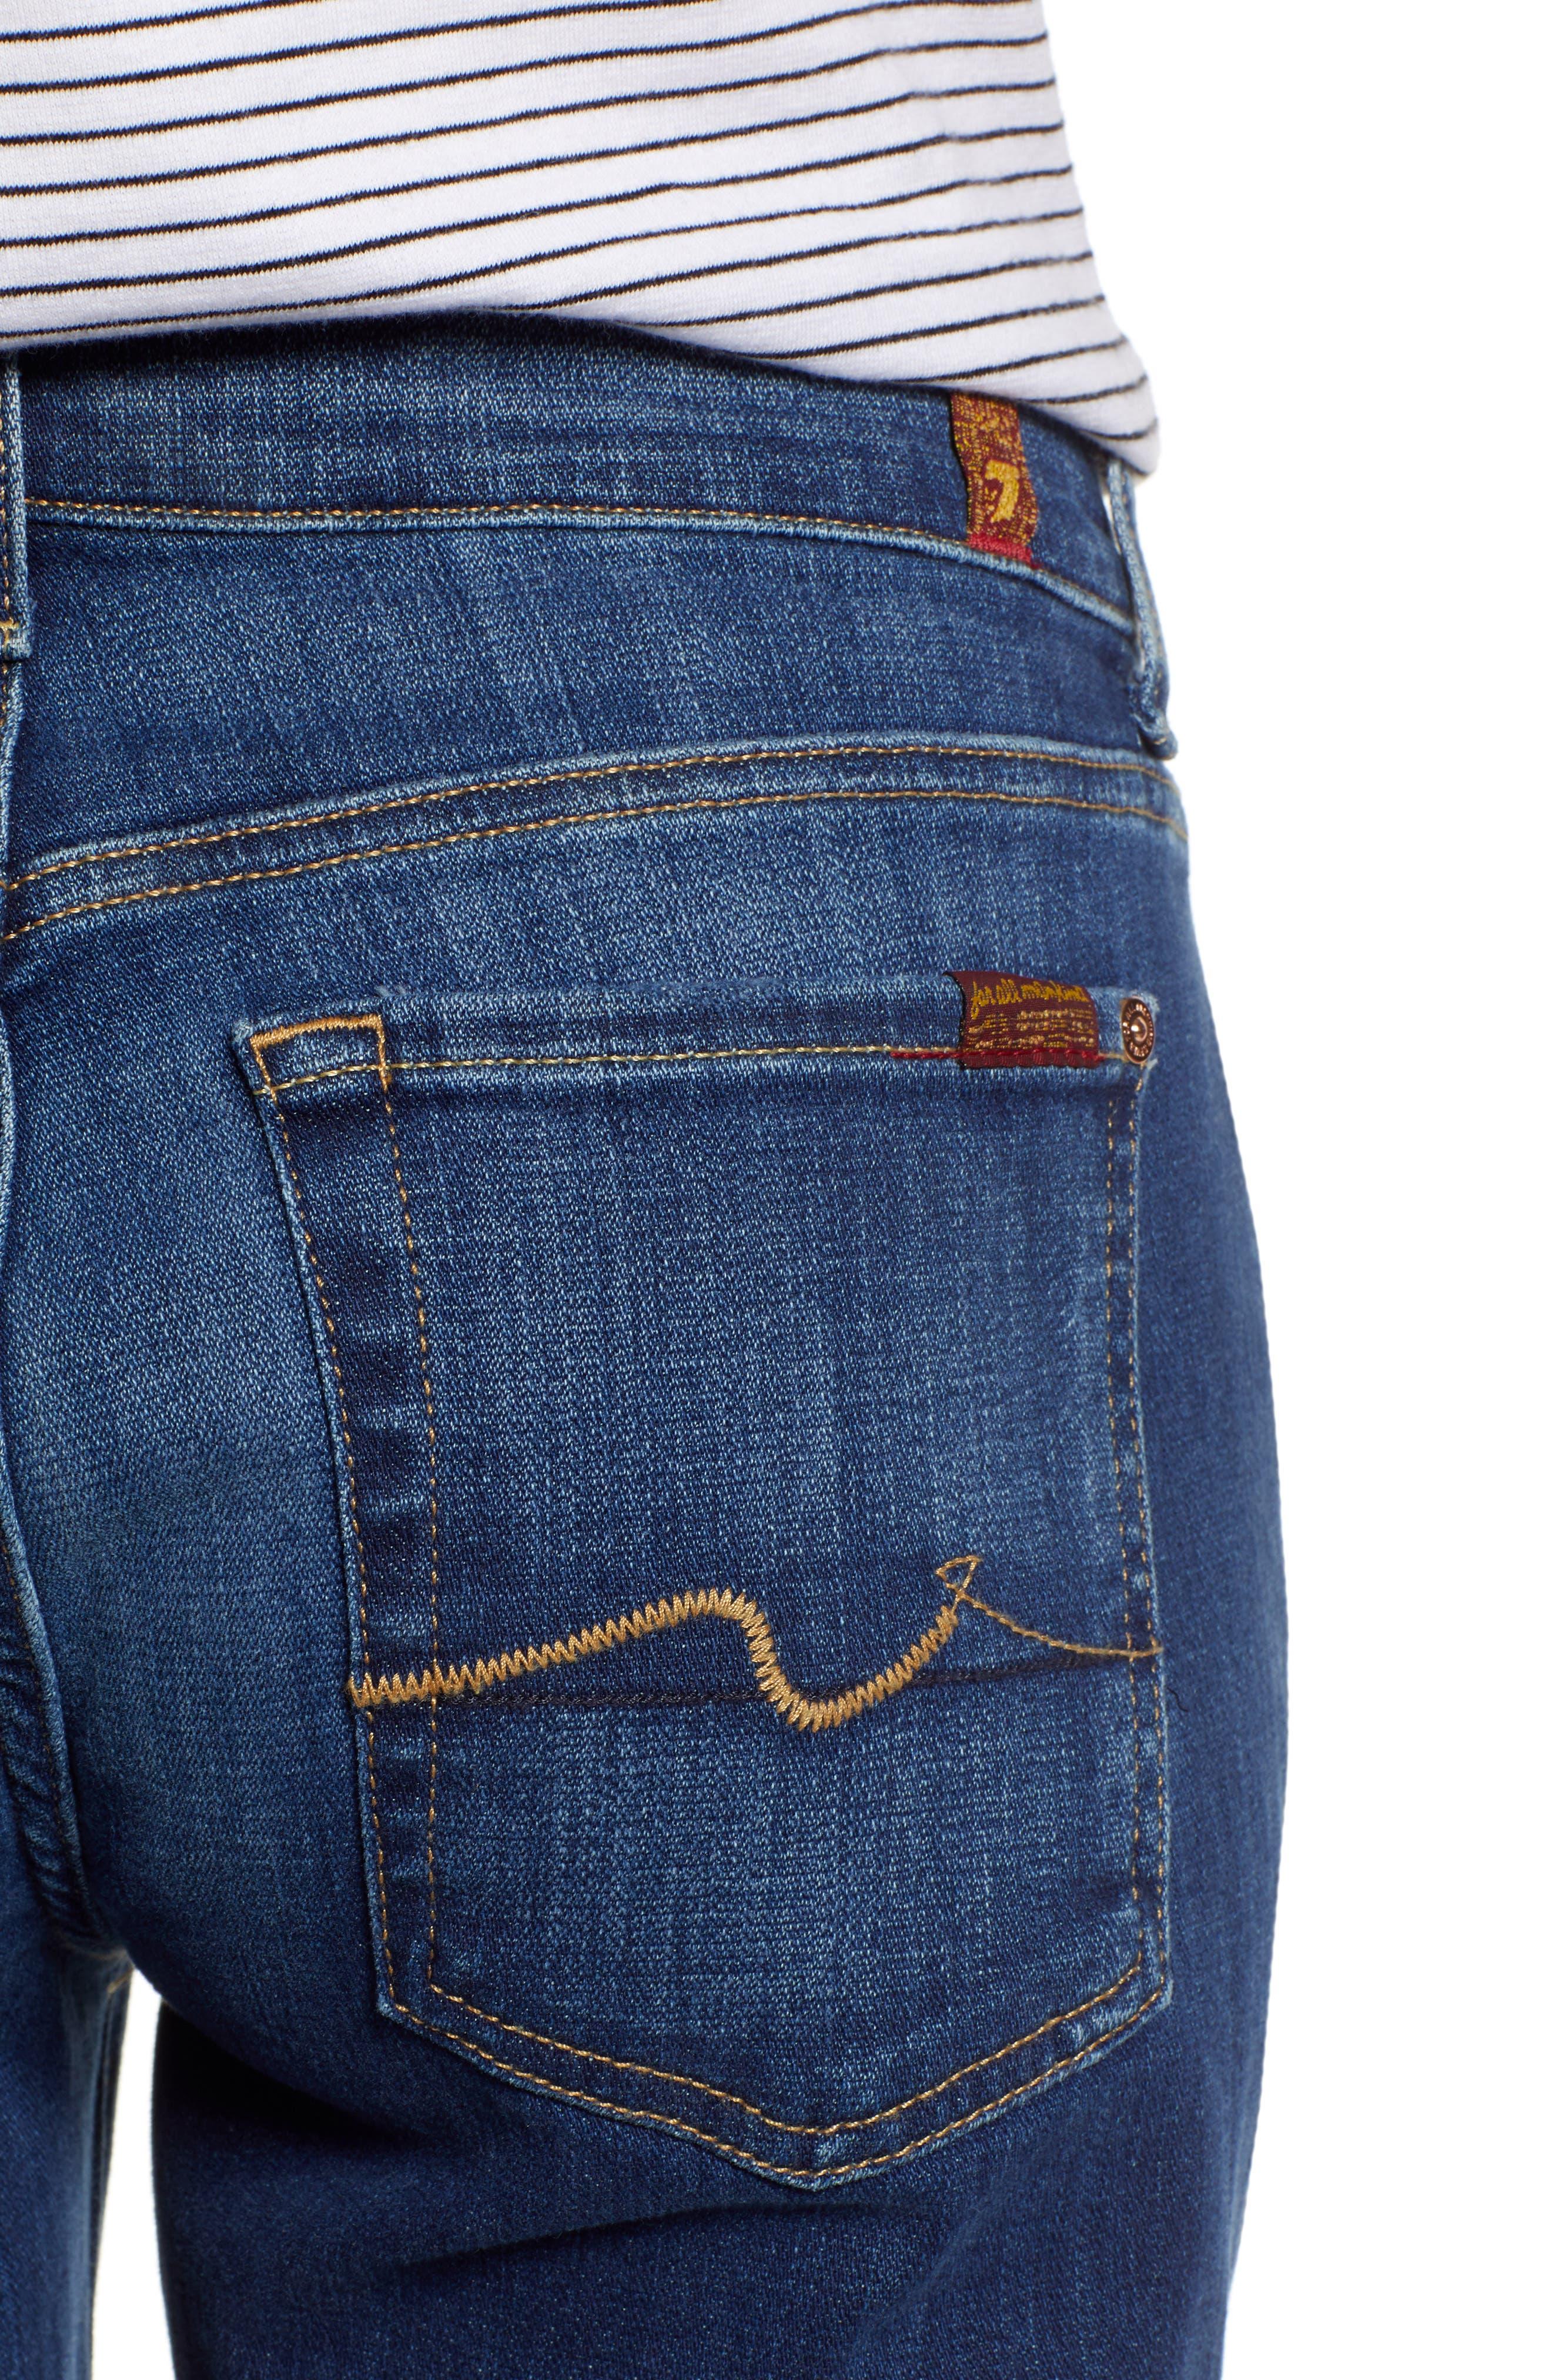 7 FOR ALL MANKIND<SUP>®</SUP>, Josefina Boyfriend Jeans, Alternate thumbnail 5, color, BROKEN TWILL VANITY W/ DESTROY